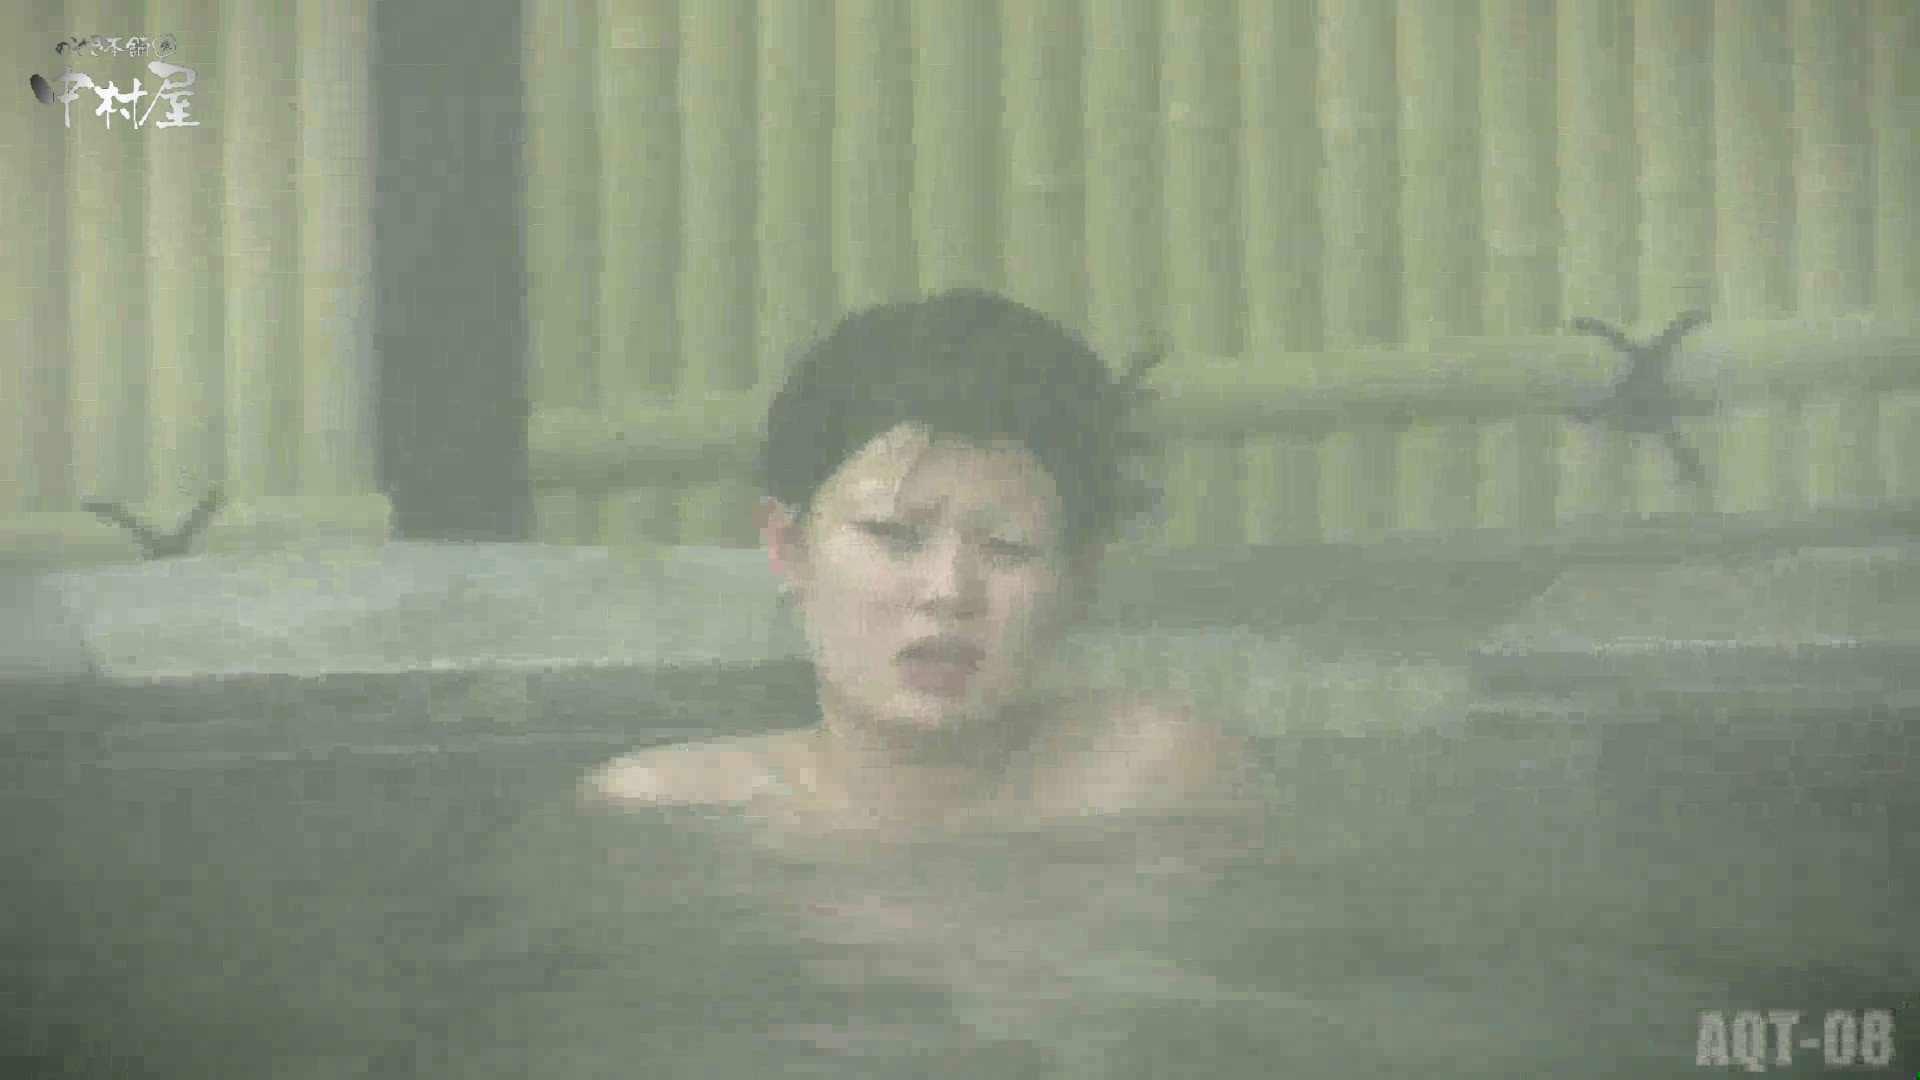 Aquaな露天風呂Vol.872潜入盗撮露天風呂八判湯 其の五 0  83pic 26